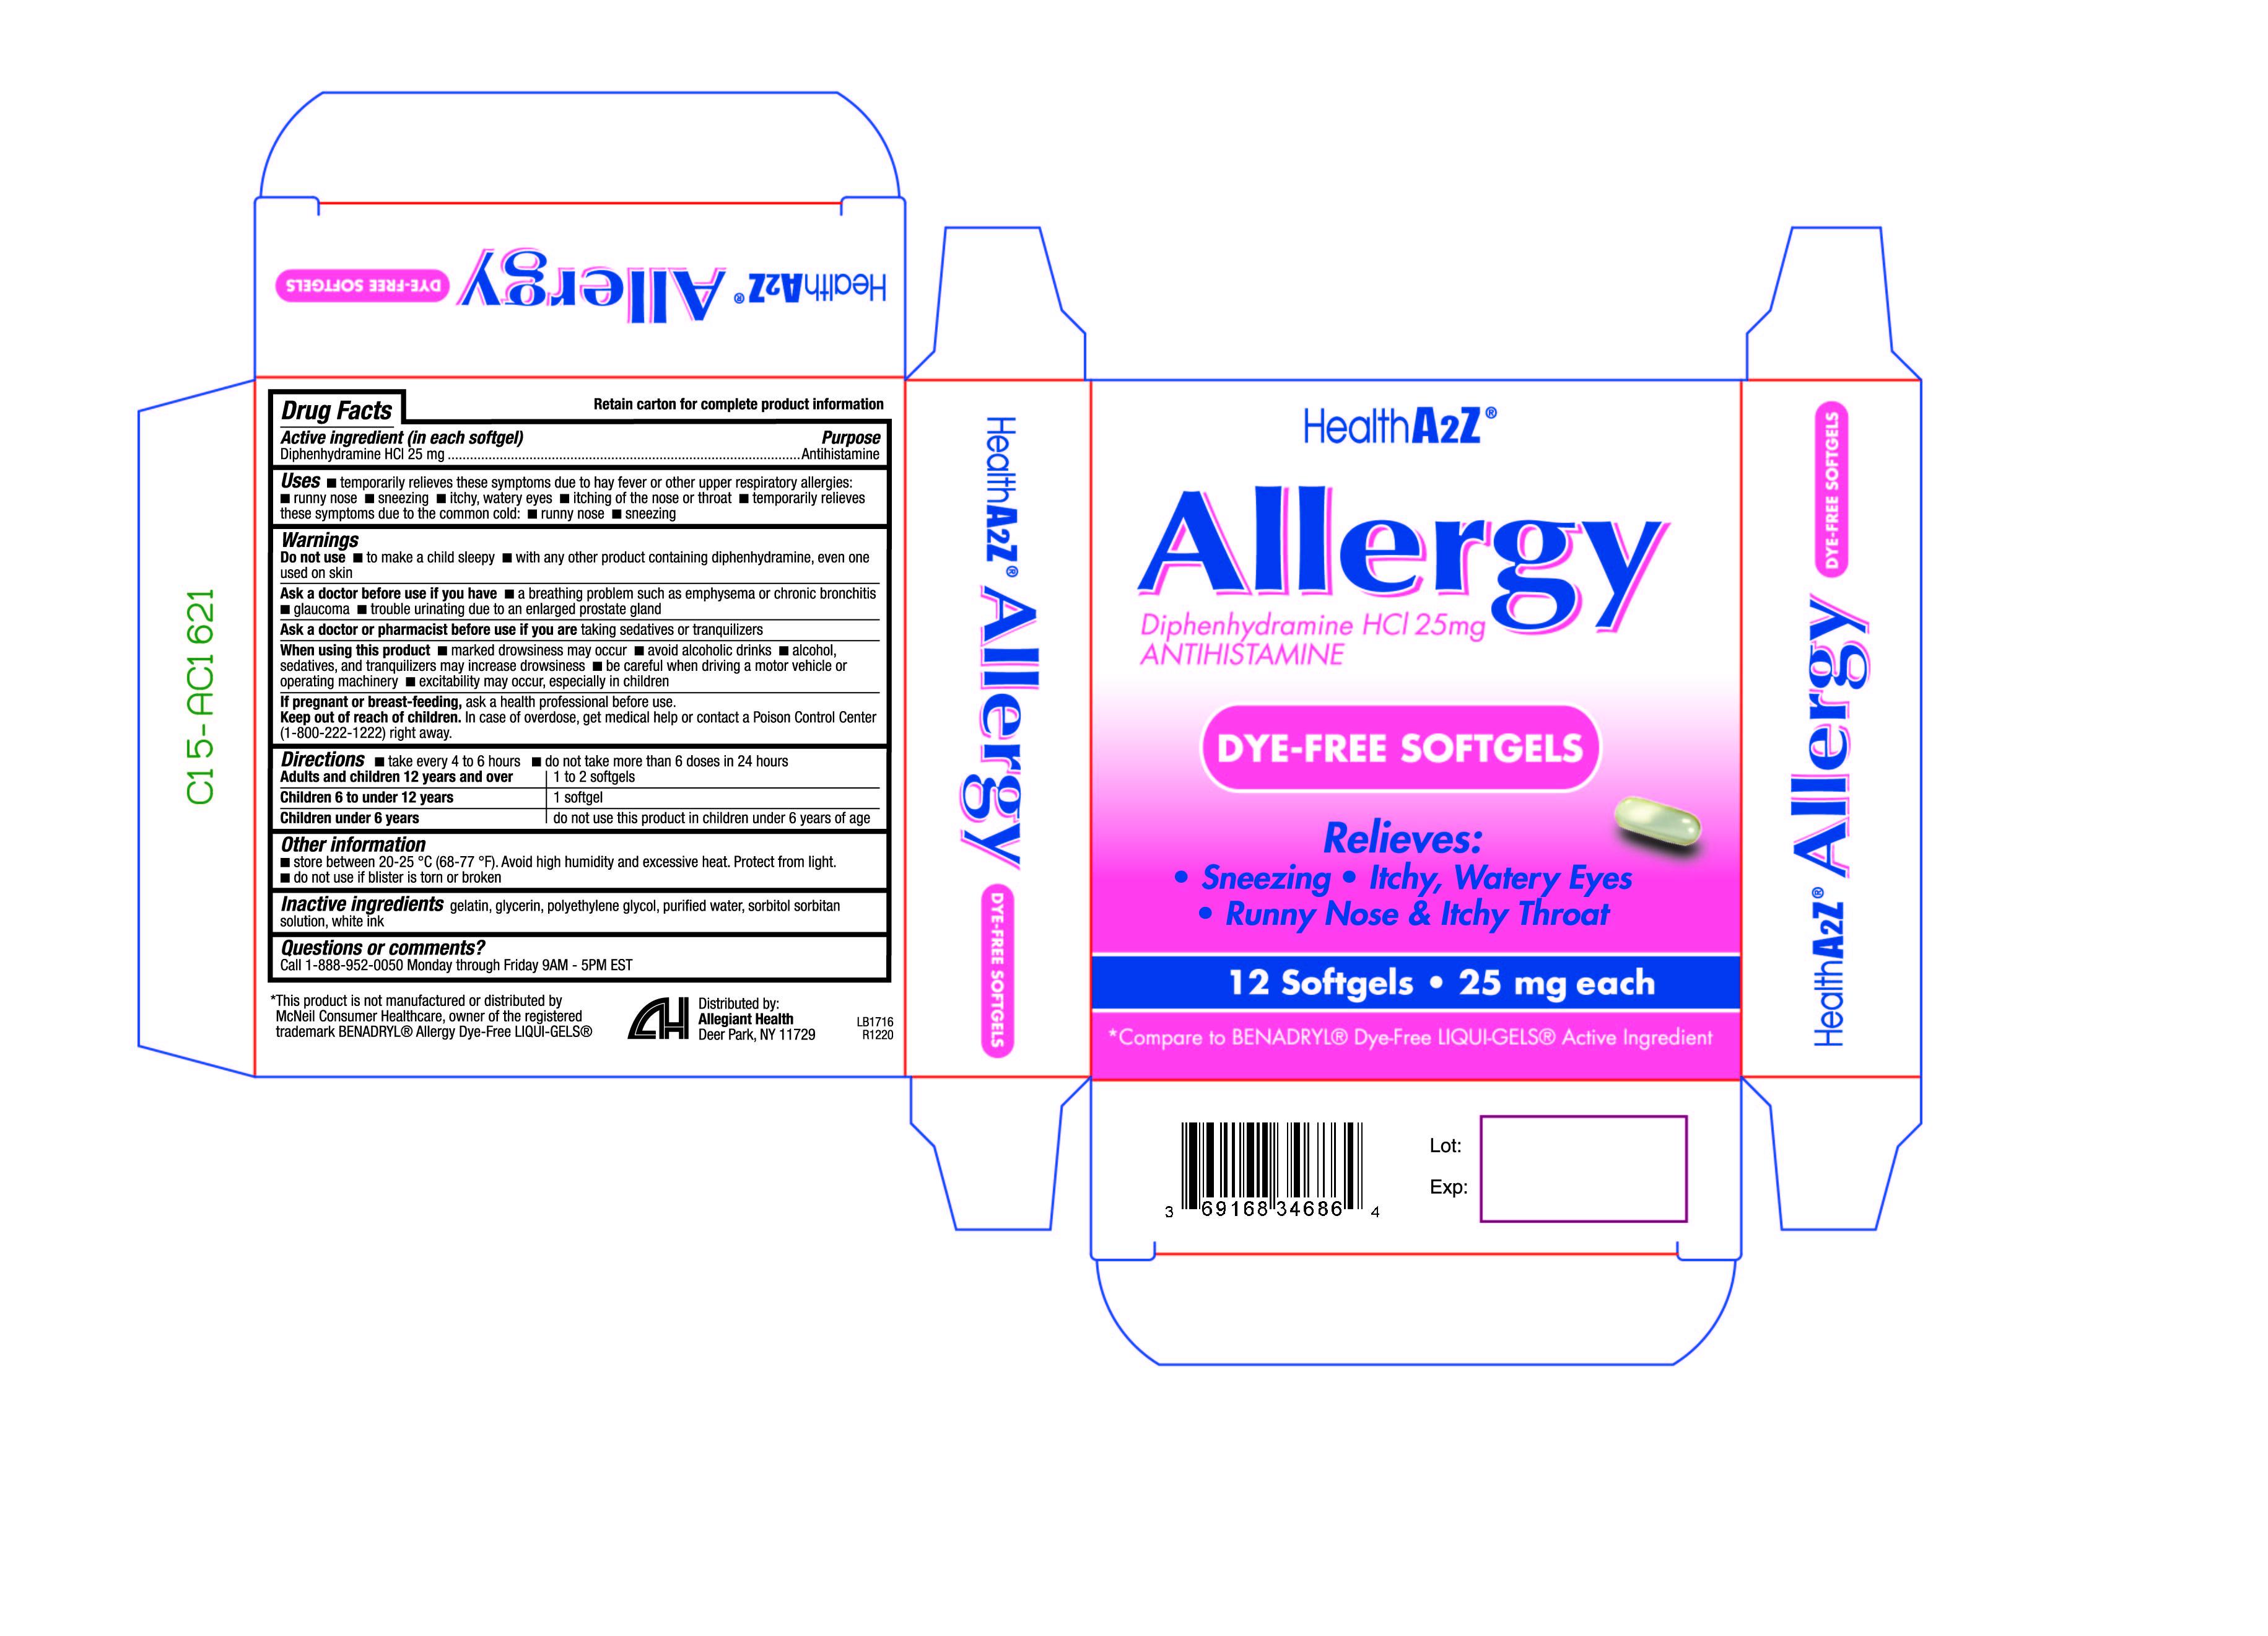 Diphenhydramine HCL 25mg